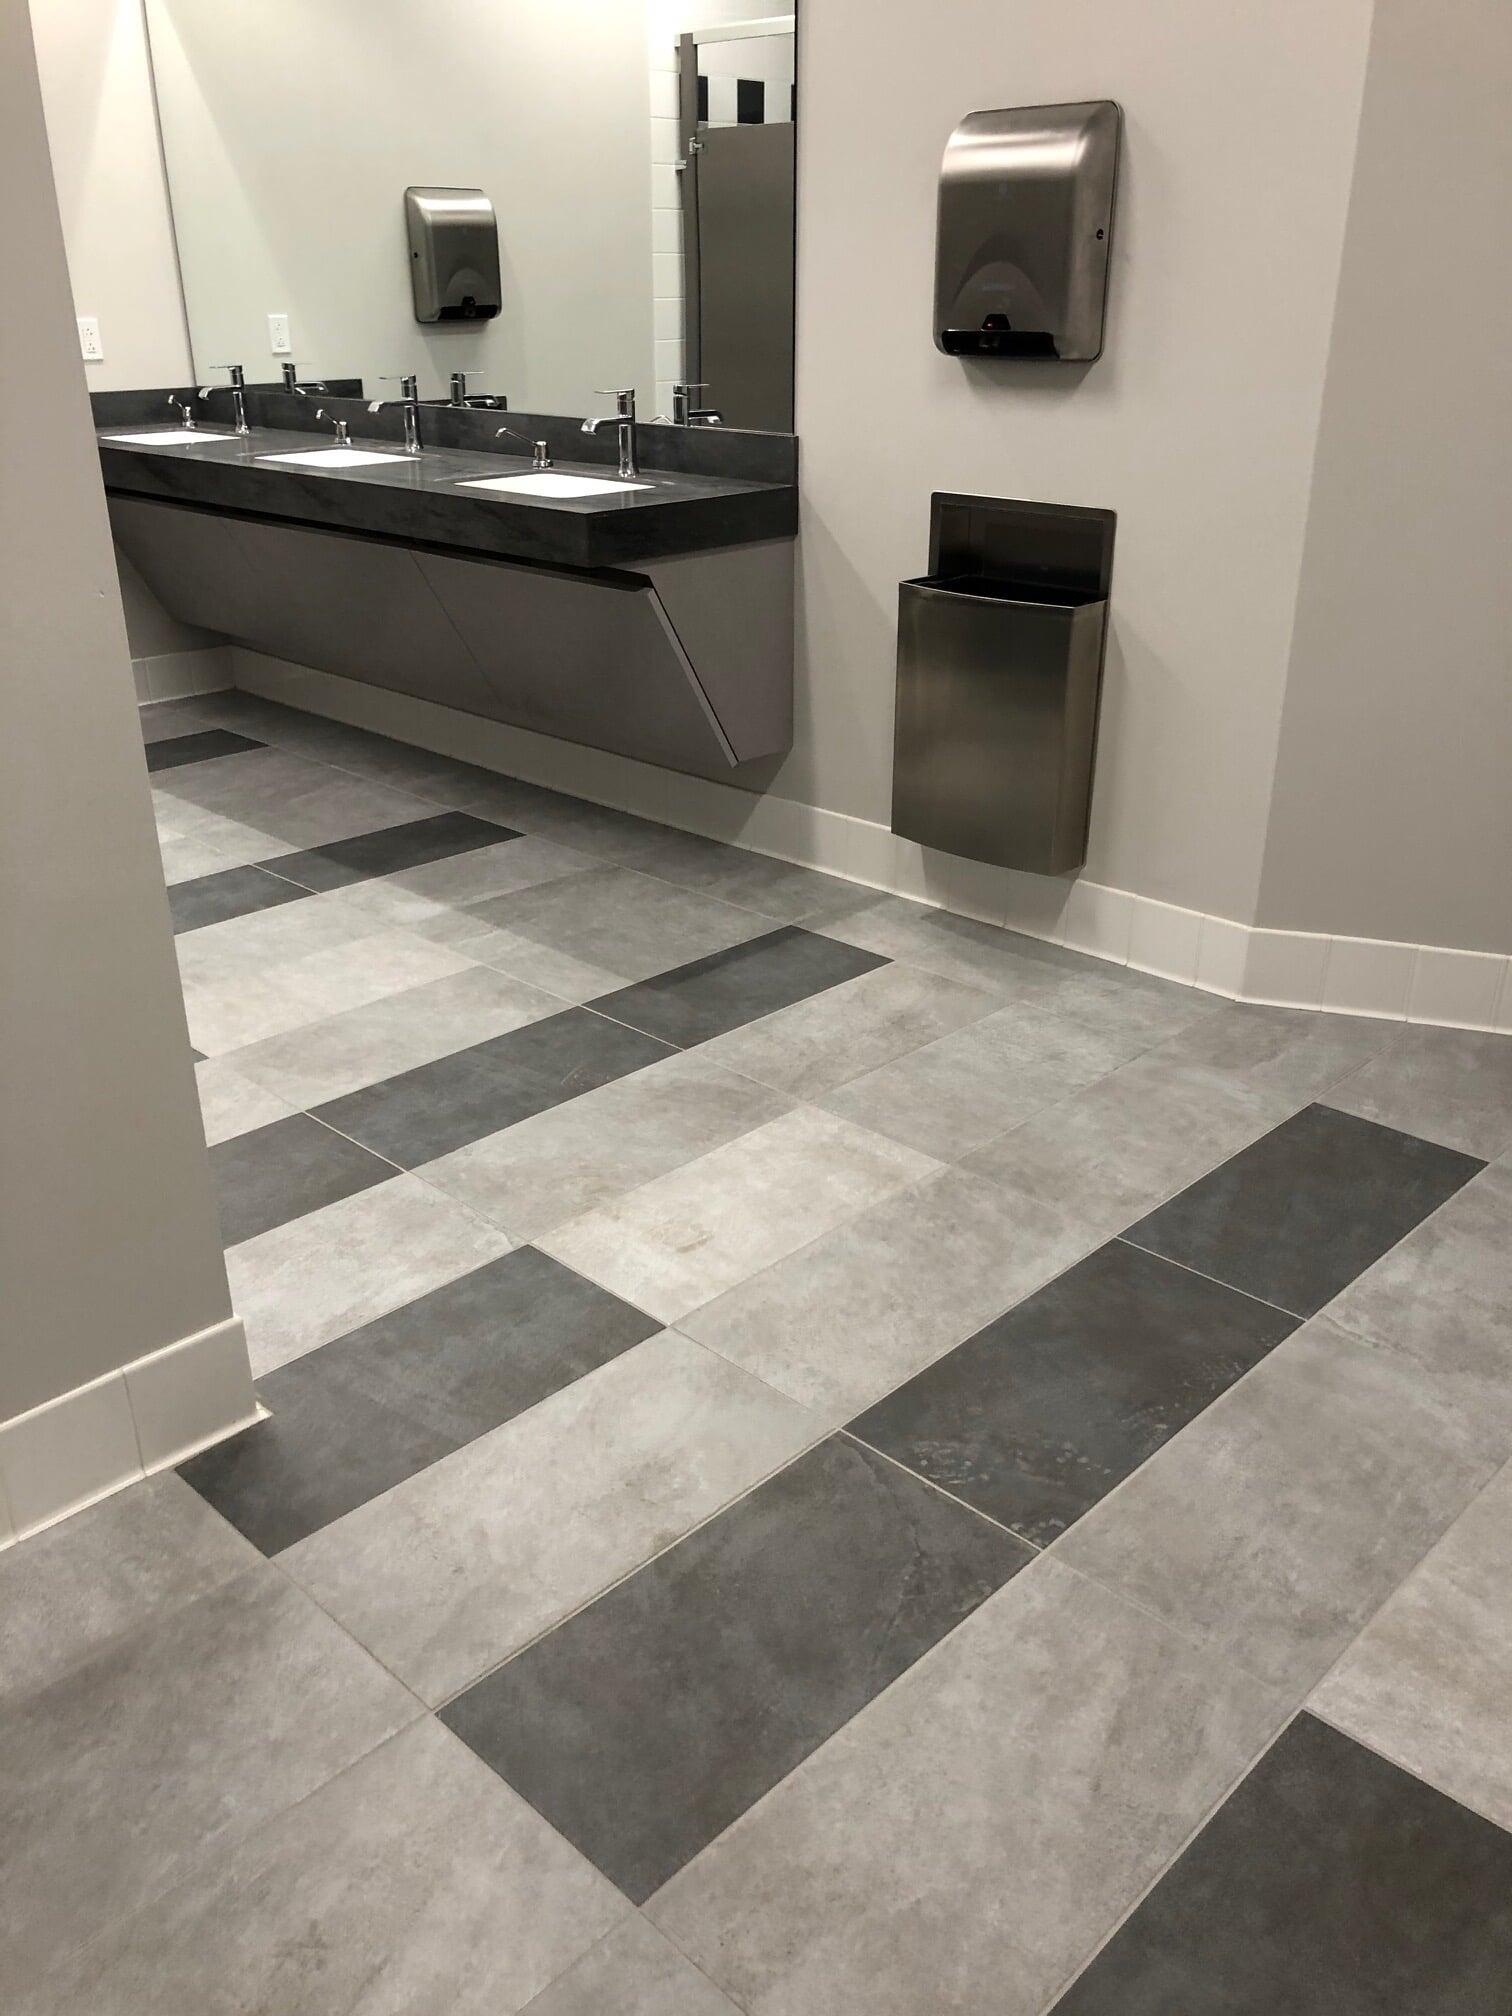 Commercial bathroom remodel in  from Barrington Carpet & Flooring Design